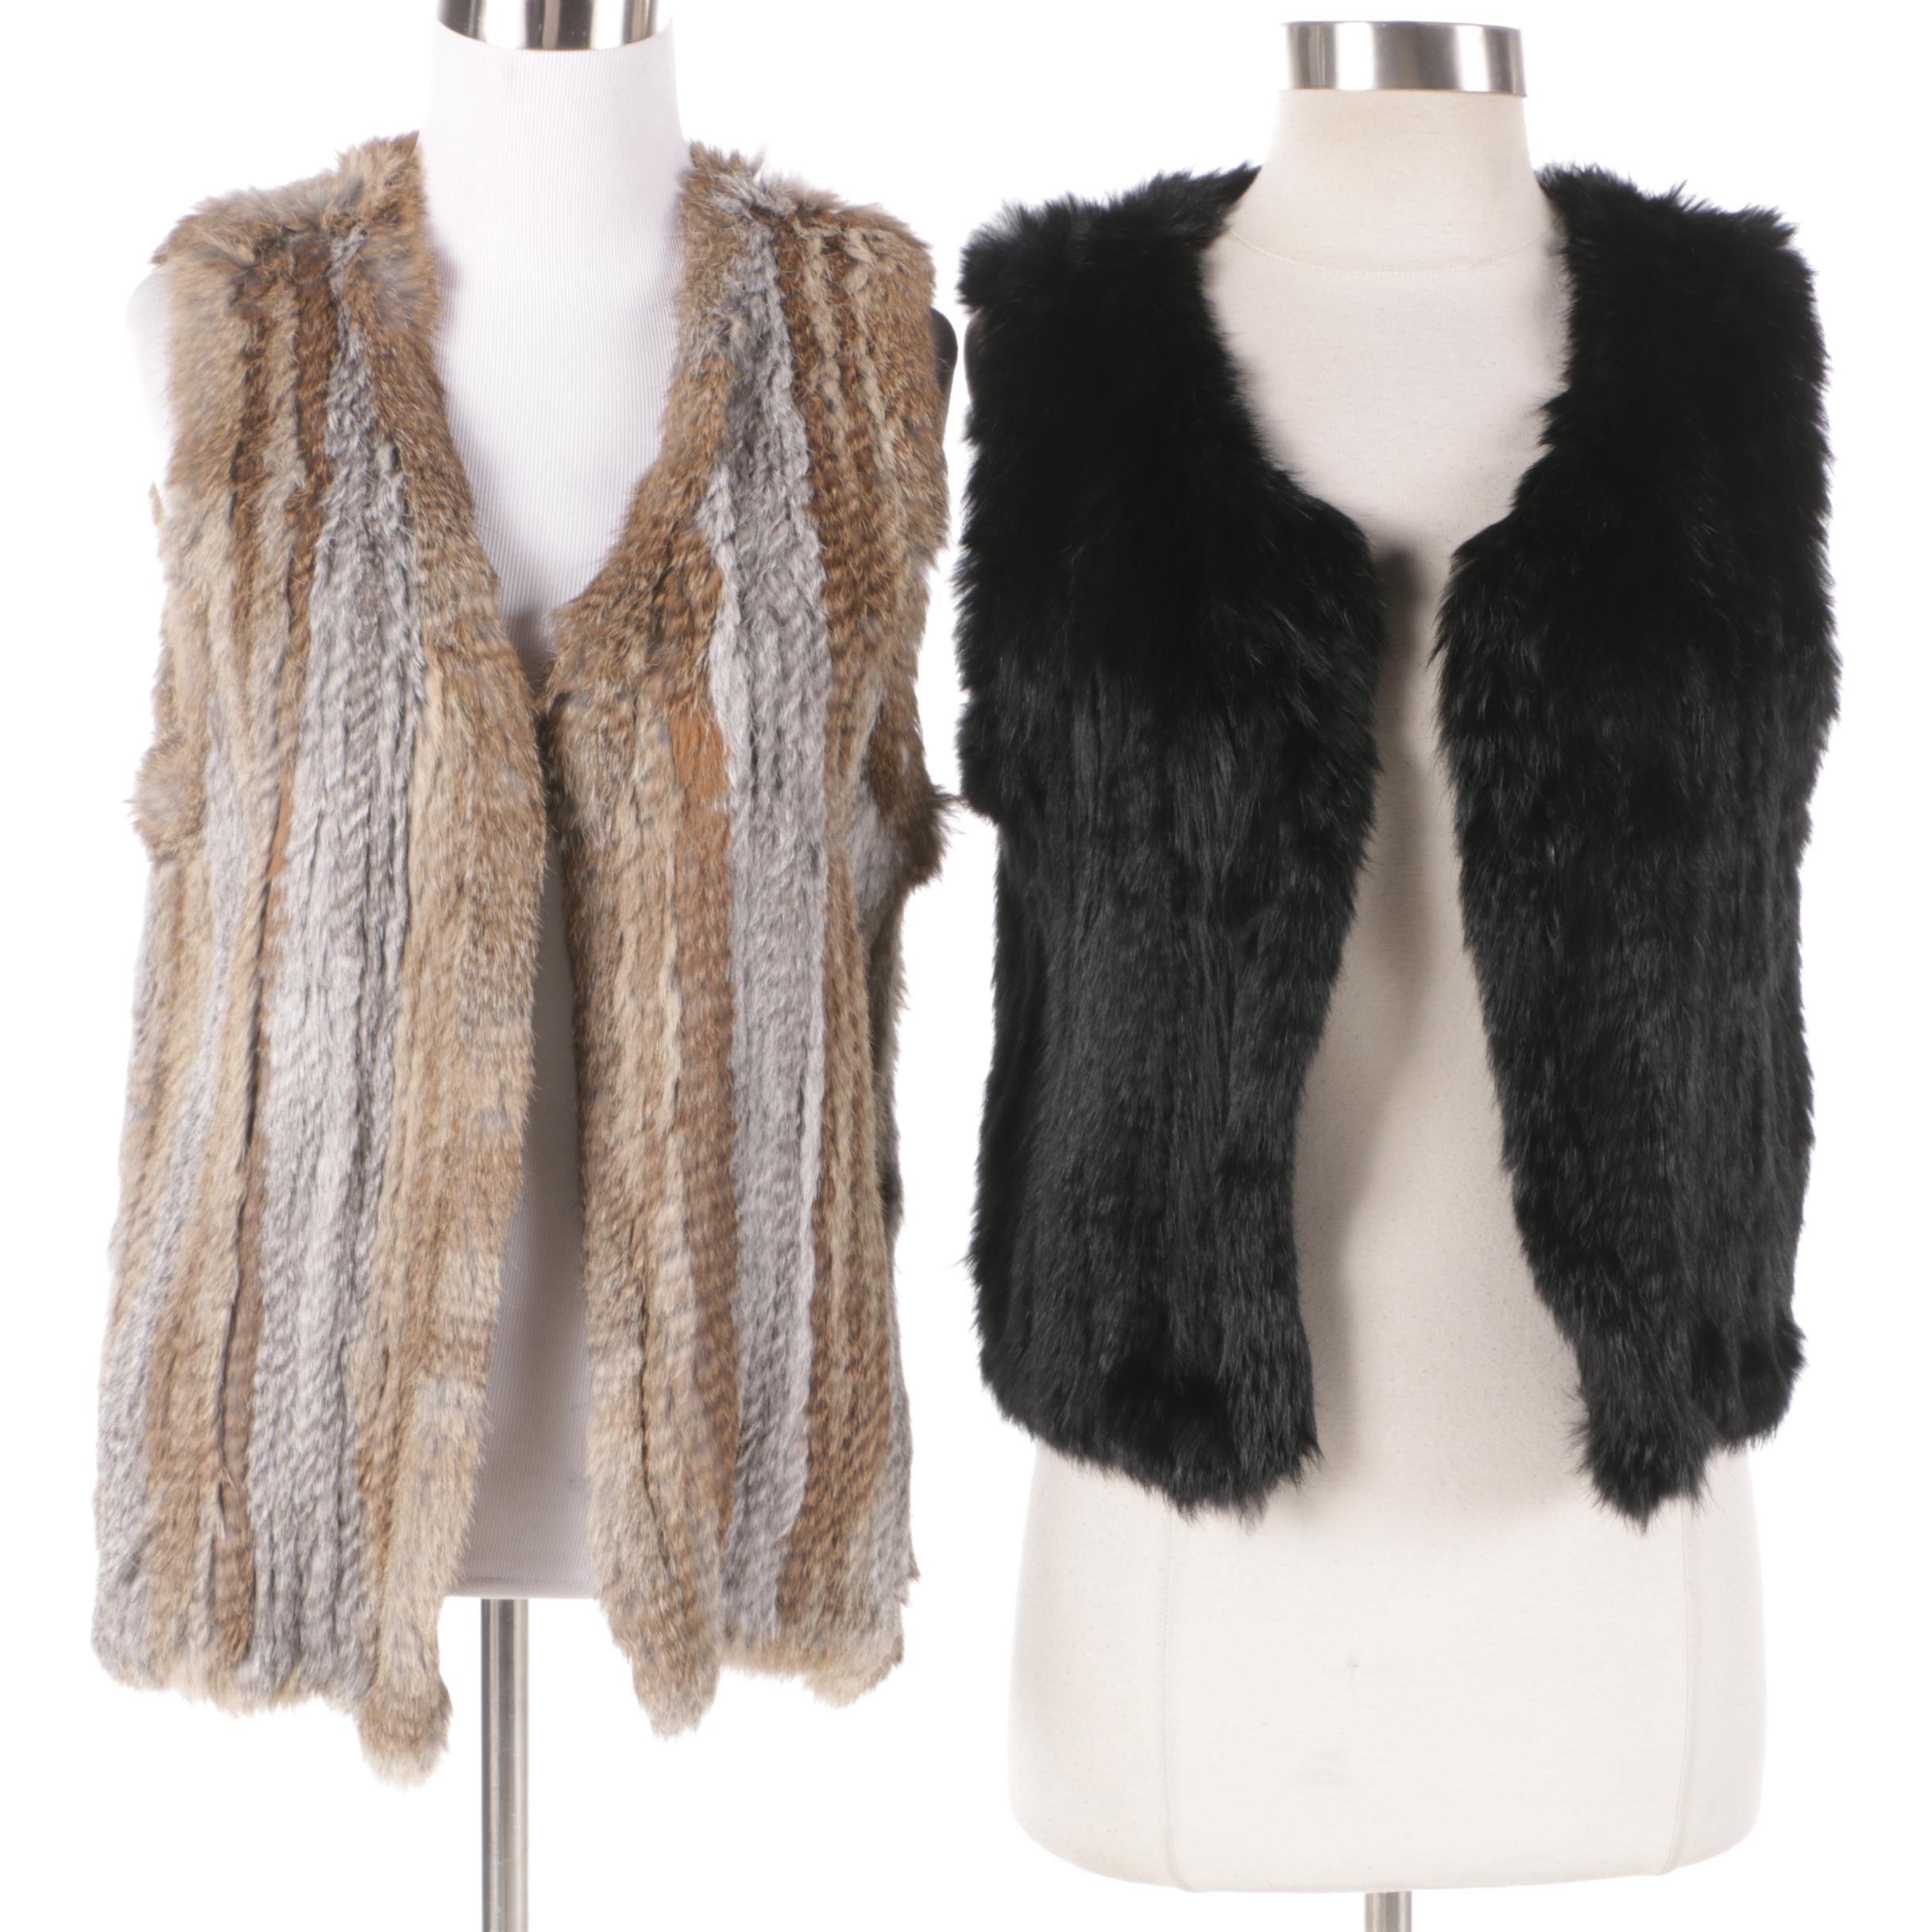 525 America Knit Rabbit Fur Vests